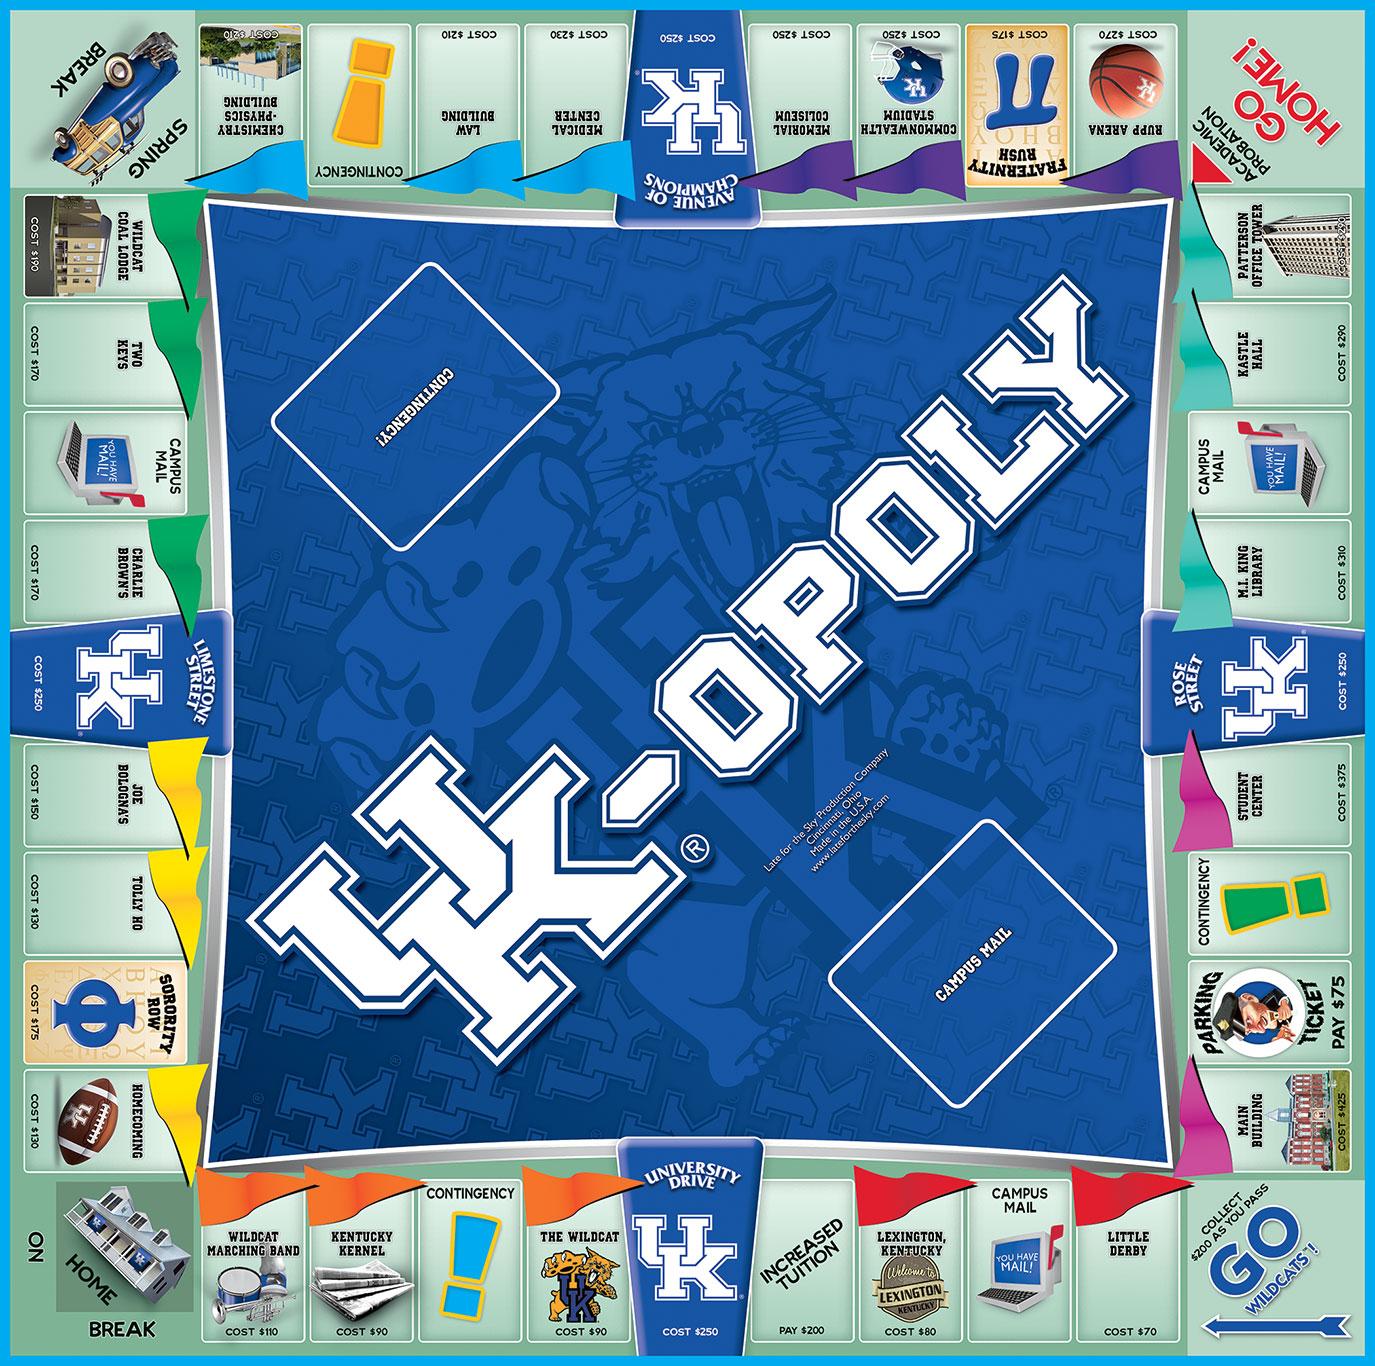 UK-OPOLY Board Game